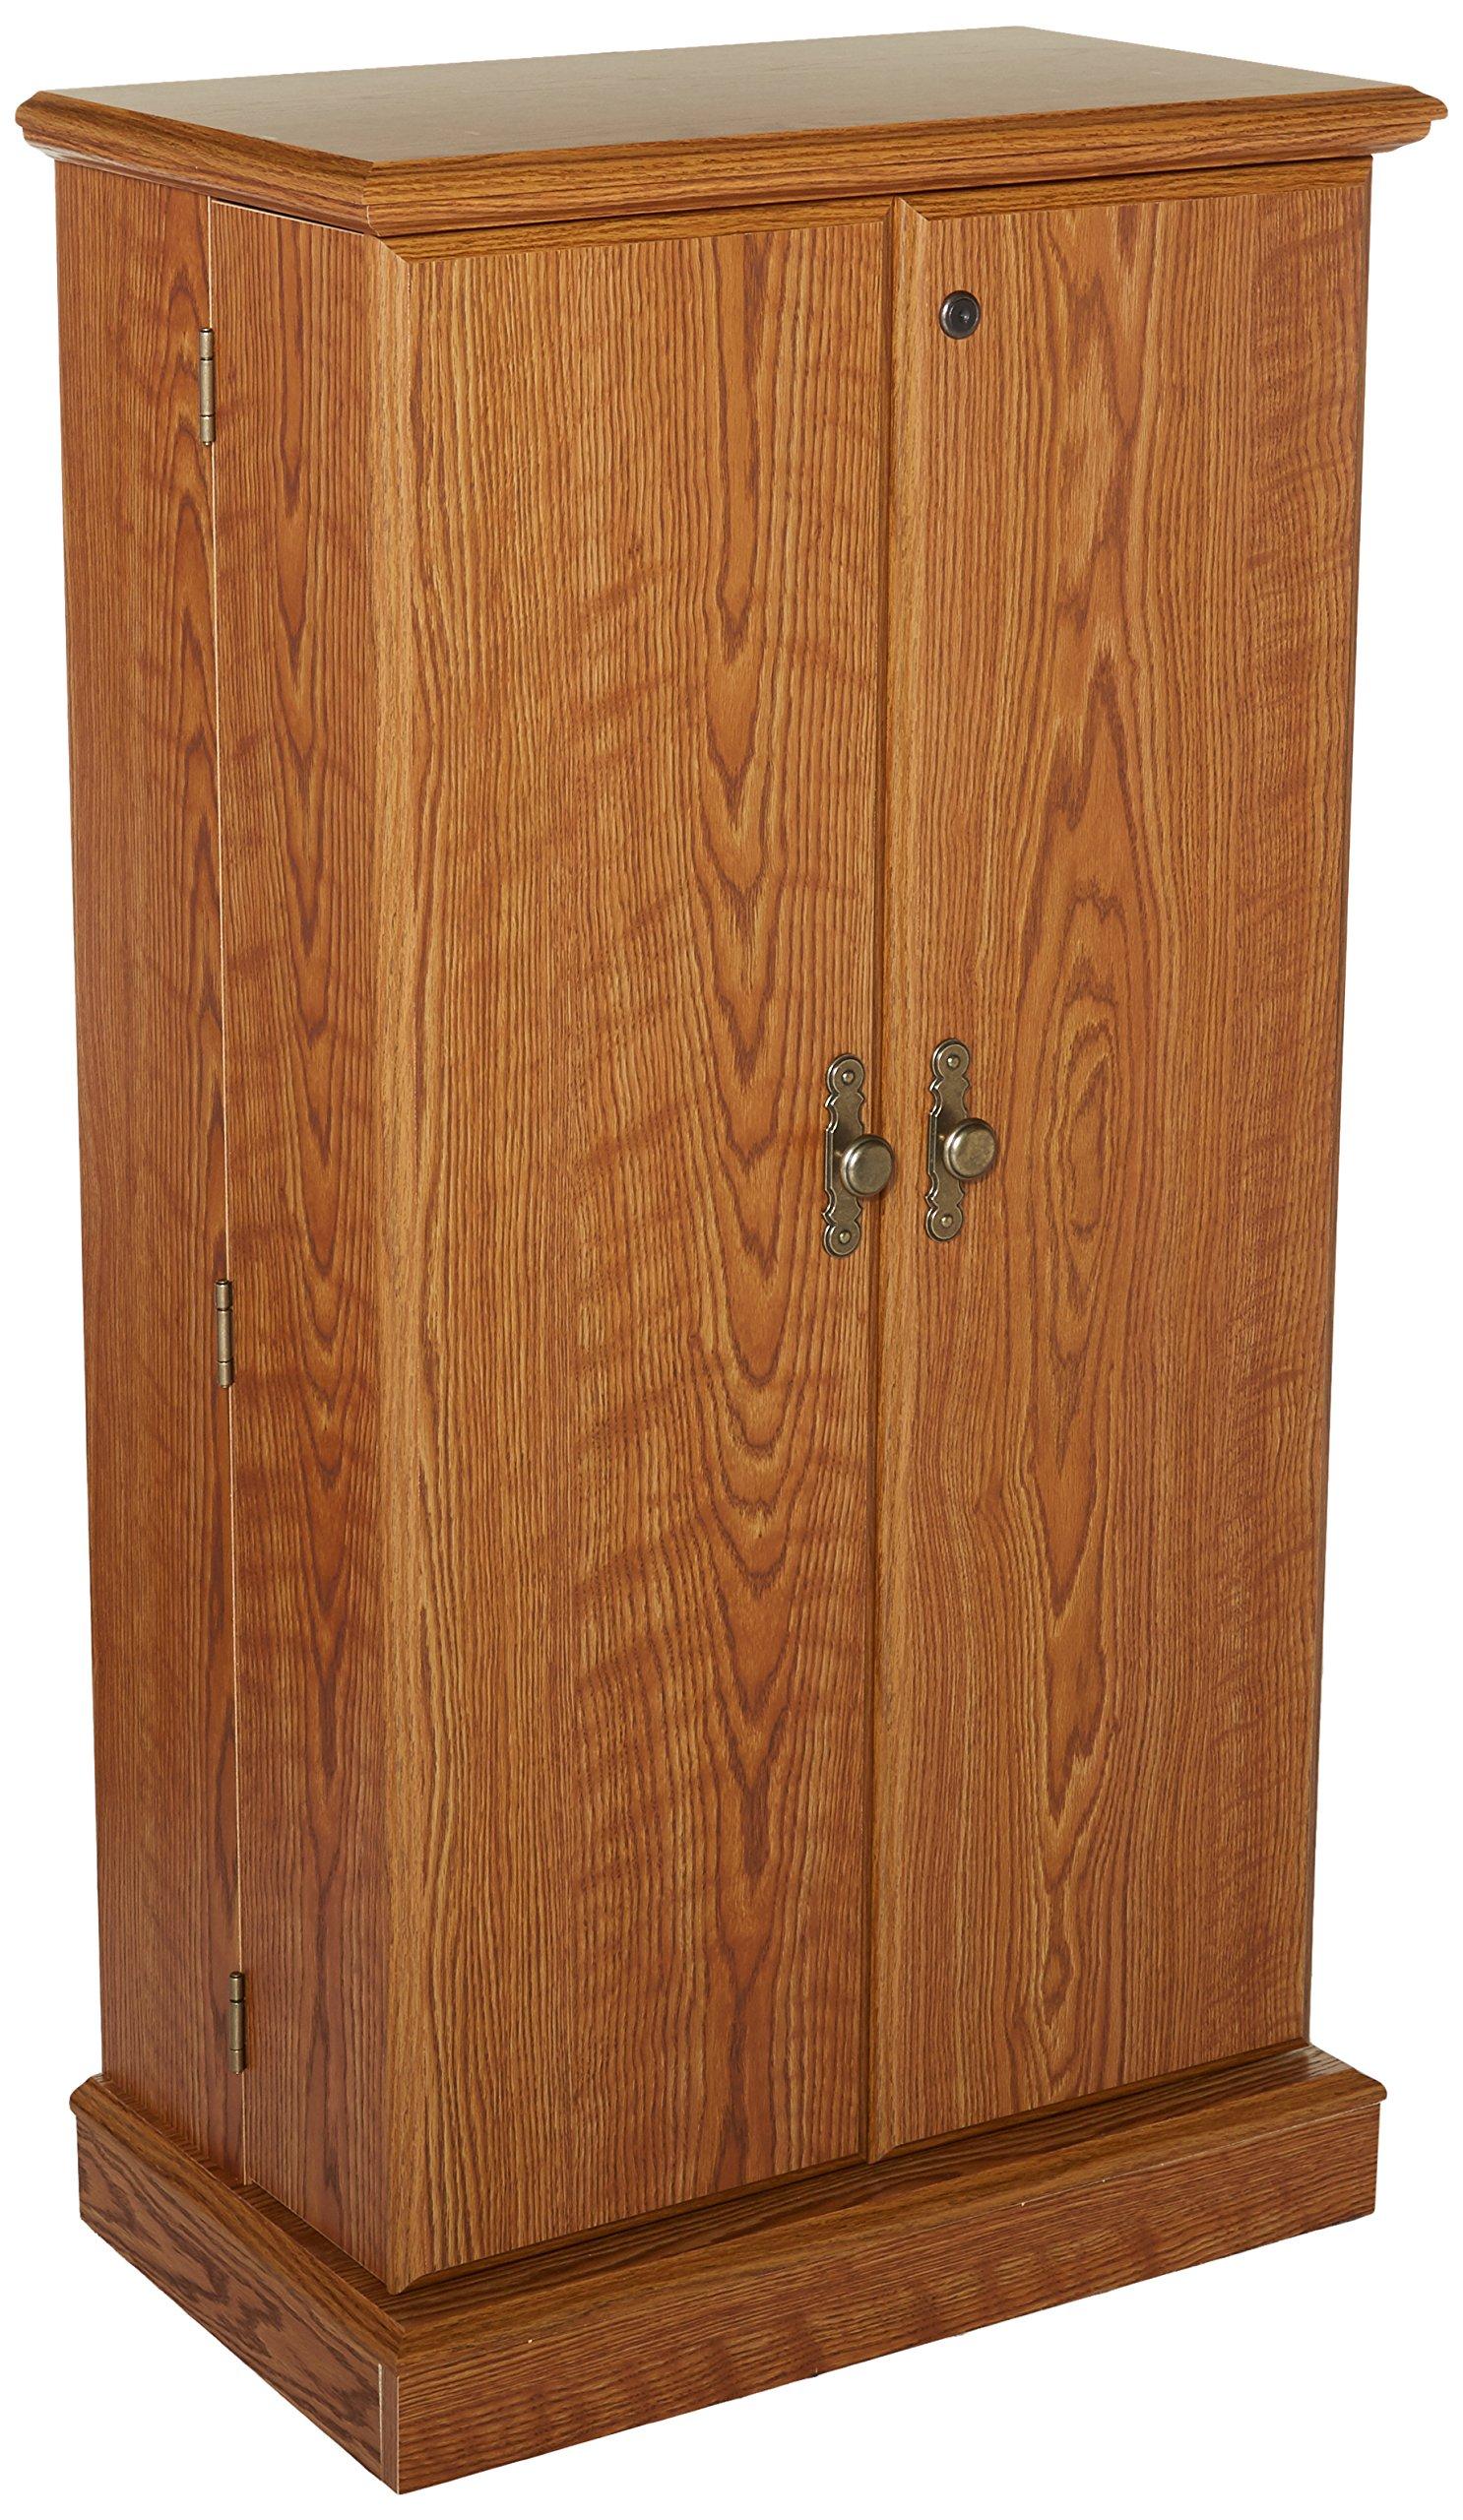 Sauder Orchard Hills Multimedia Storage Cabinet, Carolina Oak Finish by Sauder